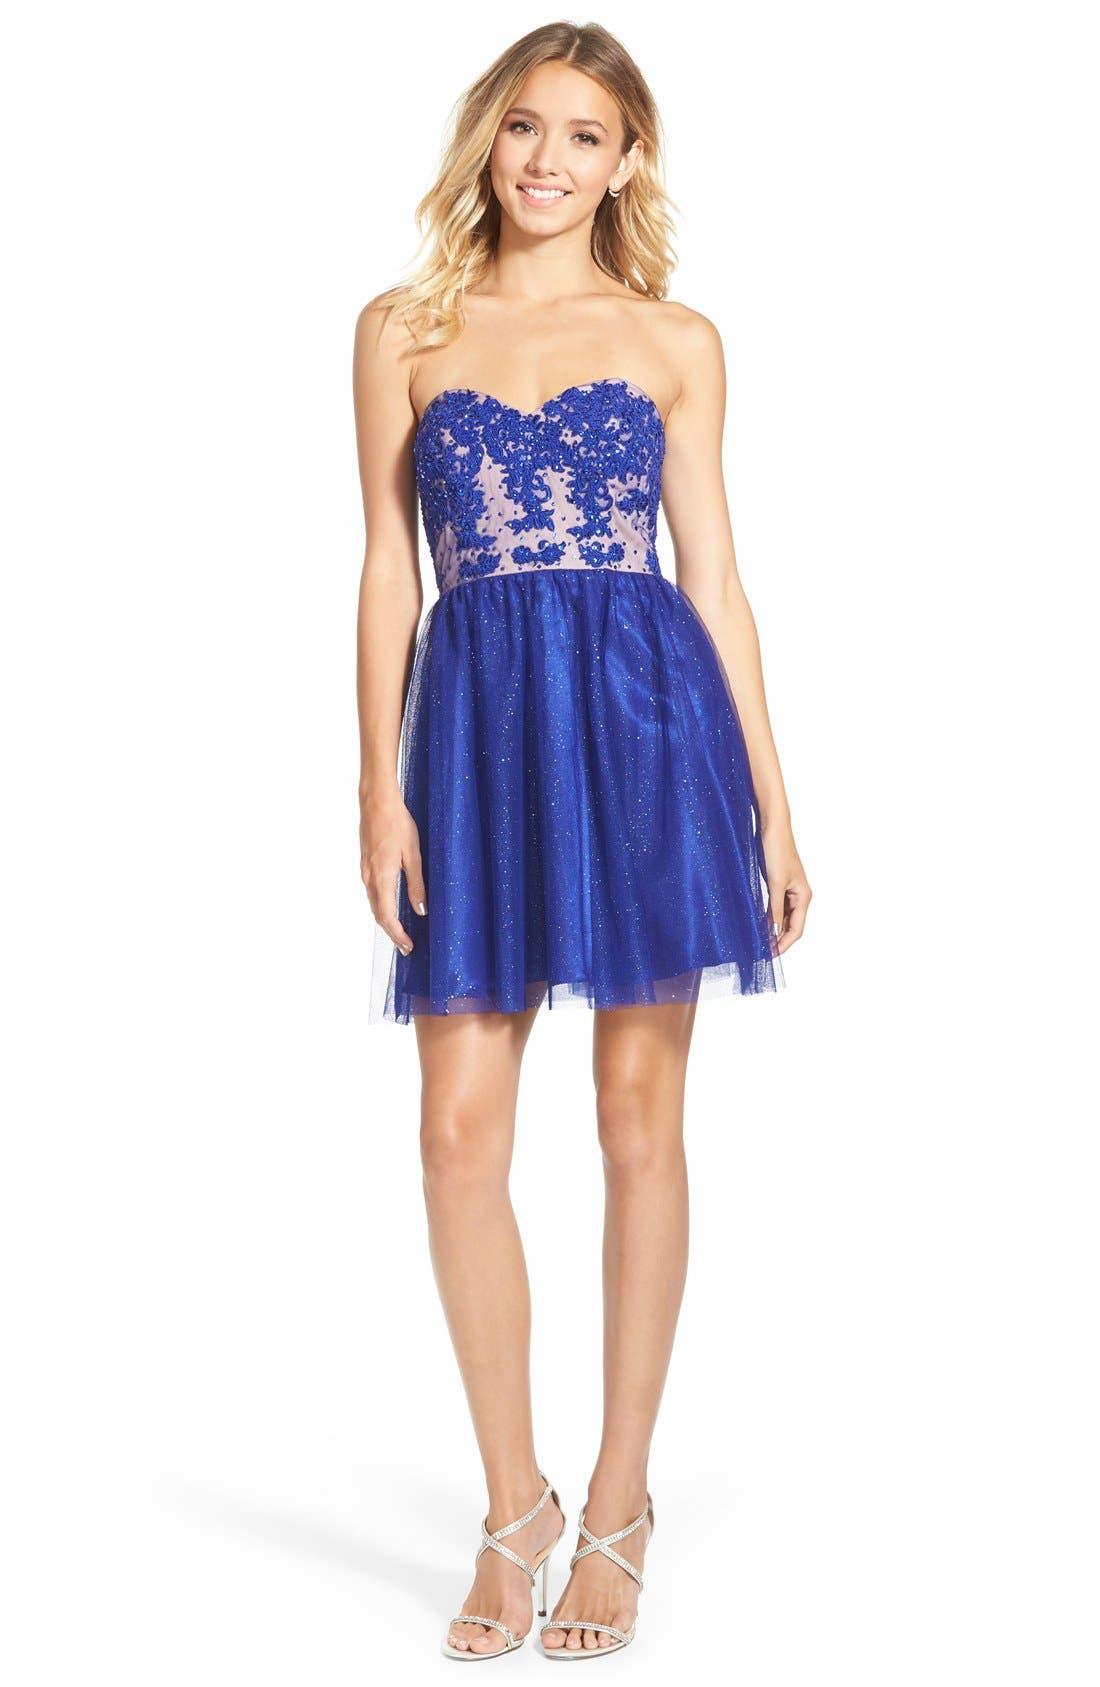 Alternate Image 1 Selected - Jump Apparel Strapless Lace Bodice Skater Dress